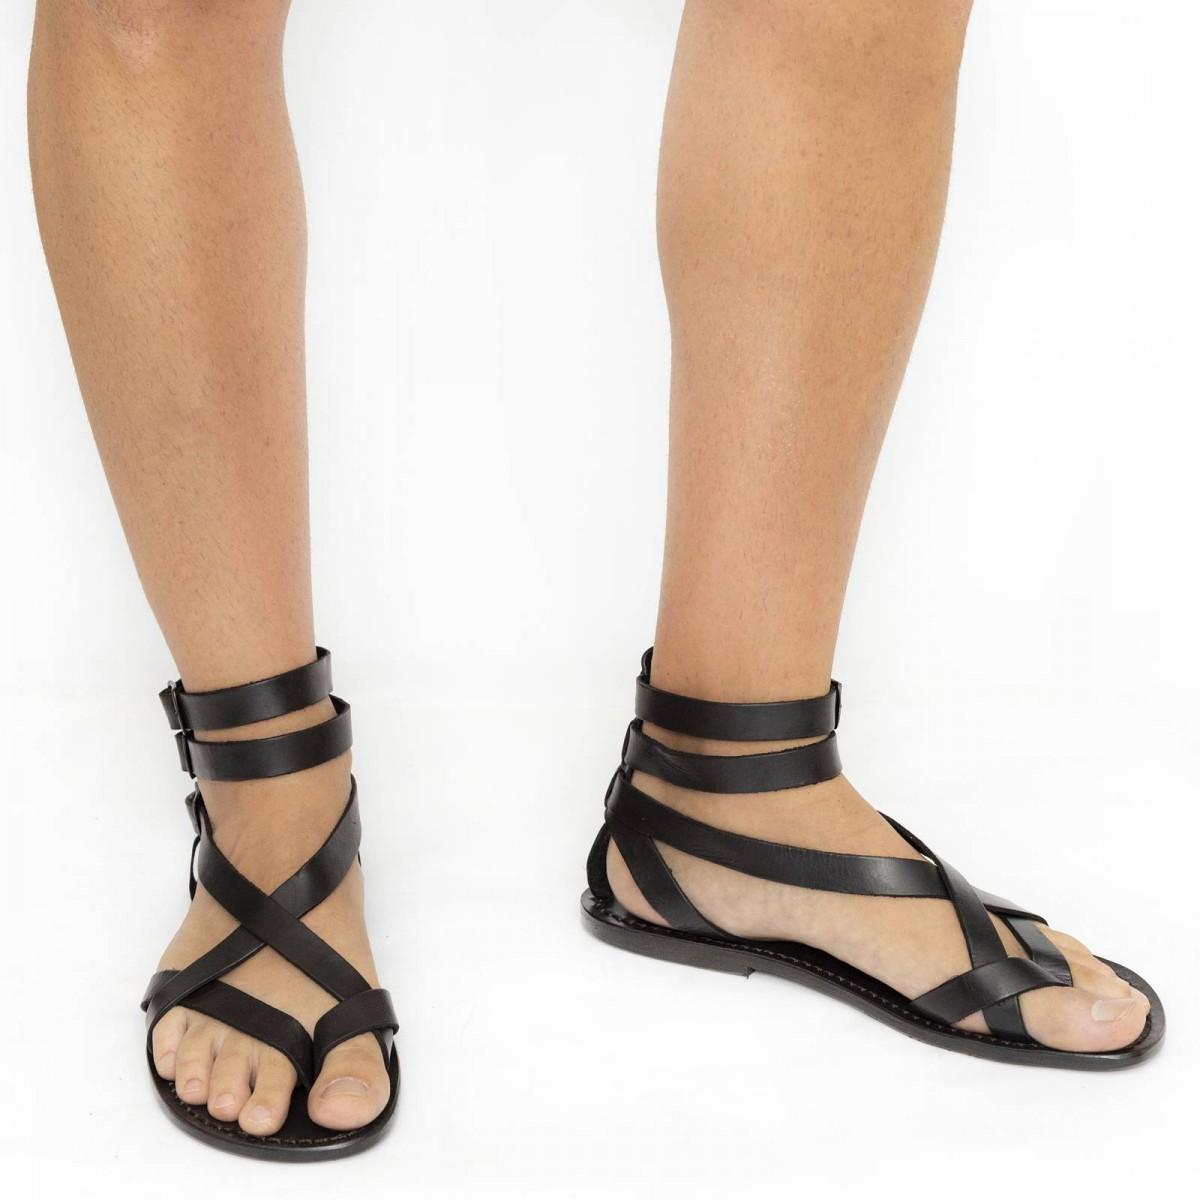 1288d028cec ... Men s black gladiator sandals Handmade in Italy ...